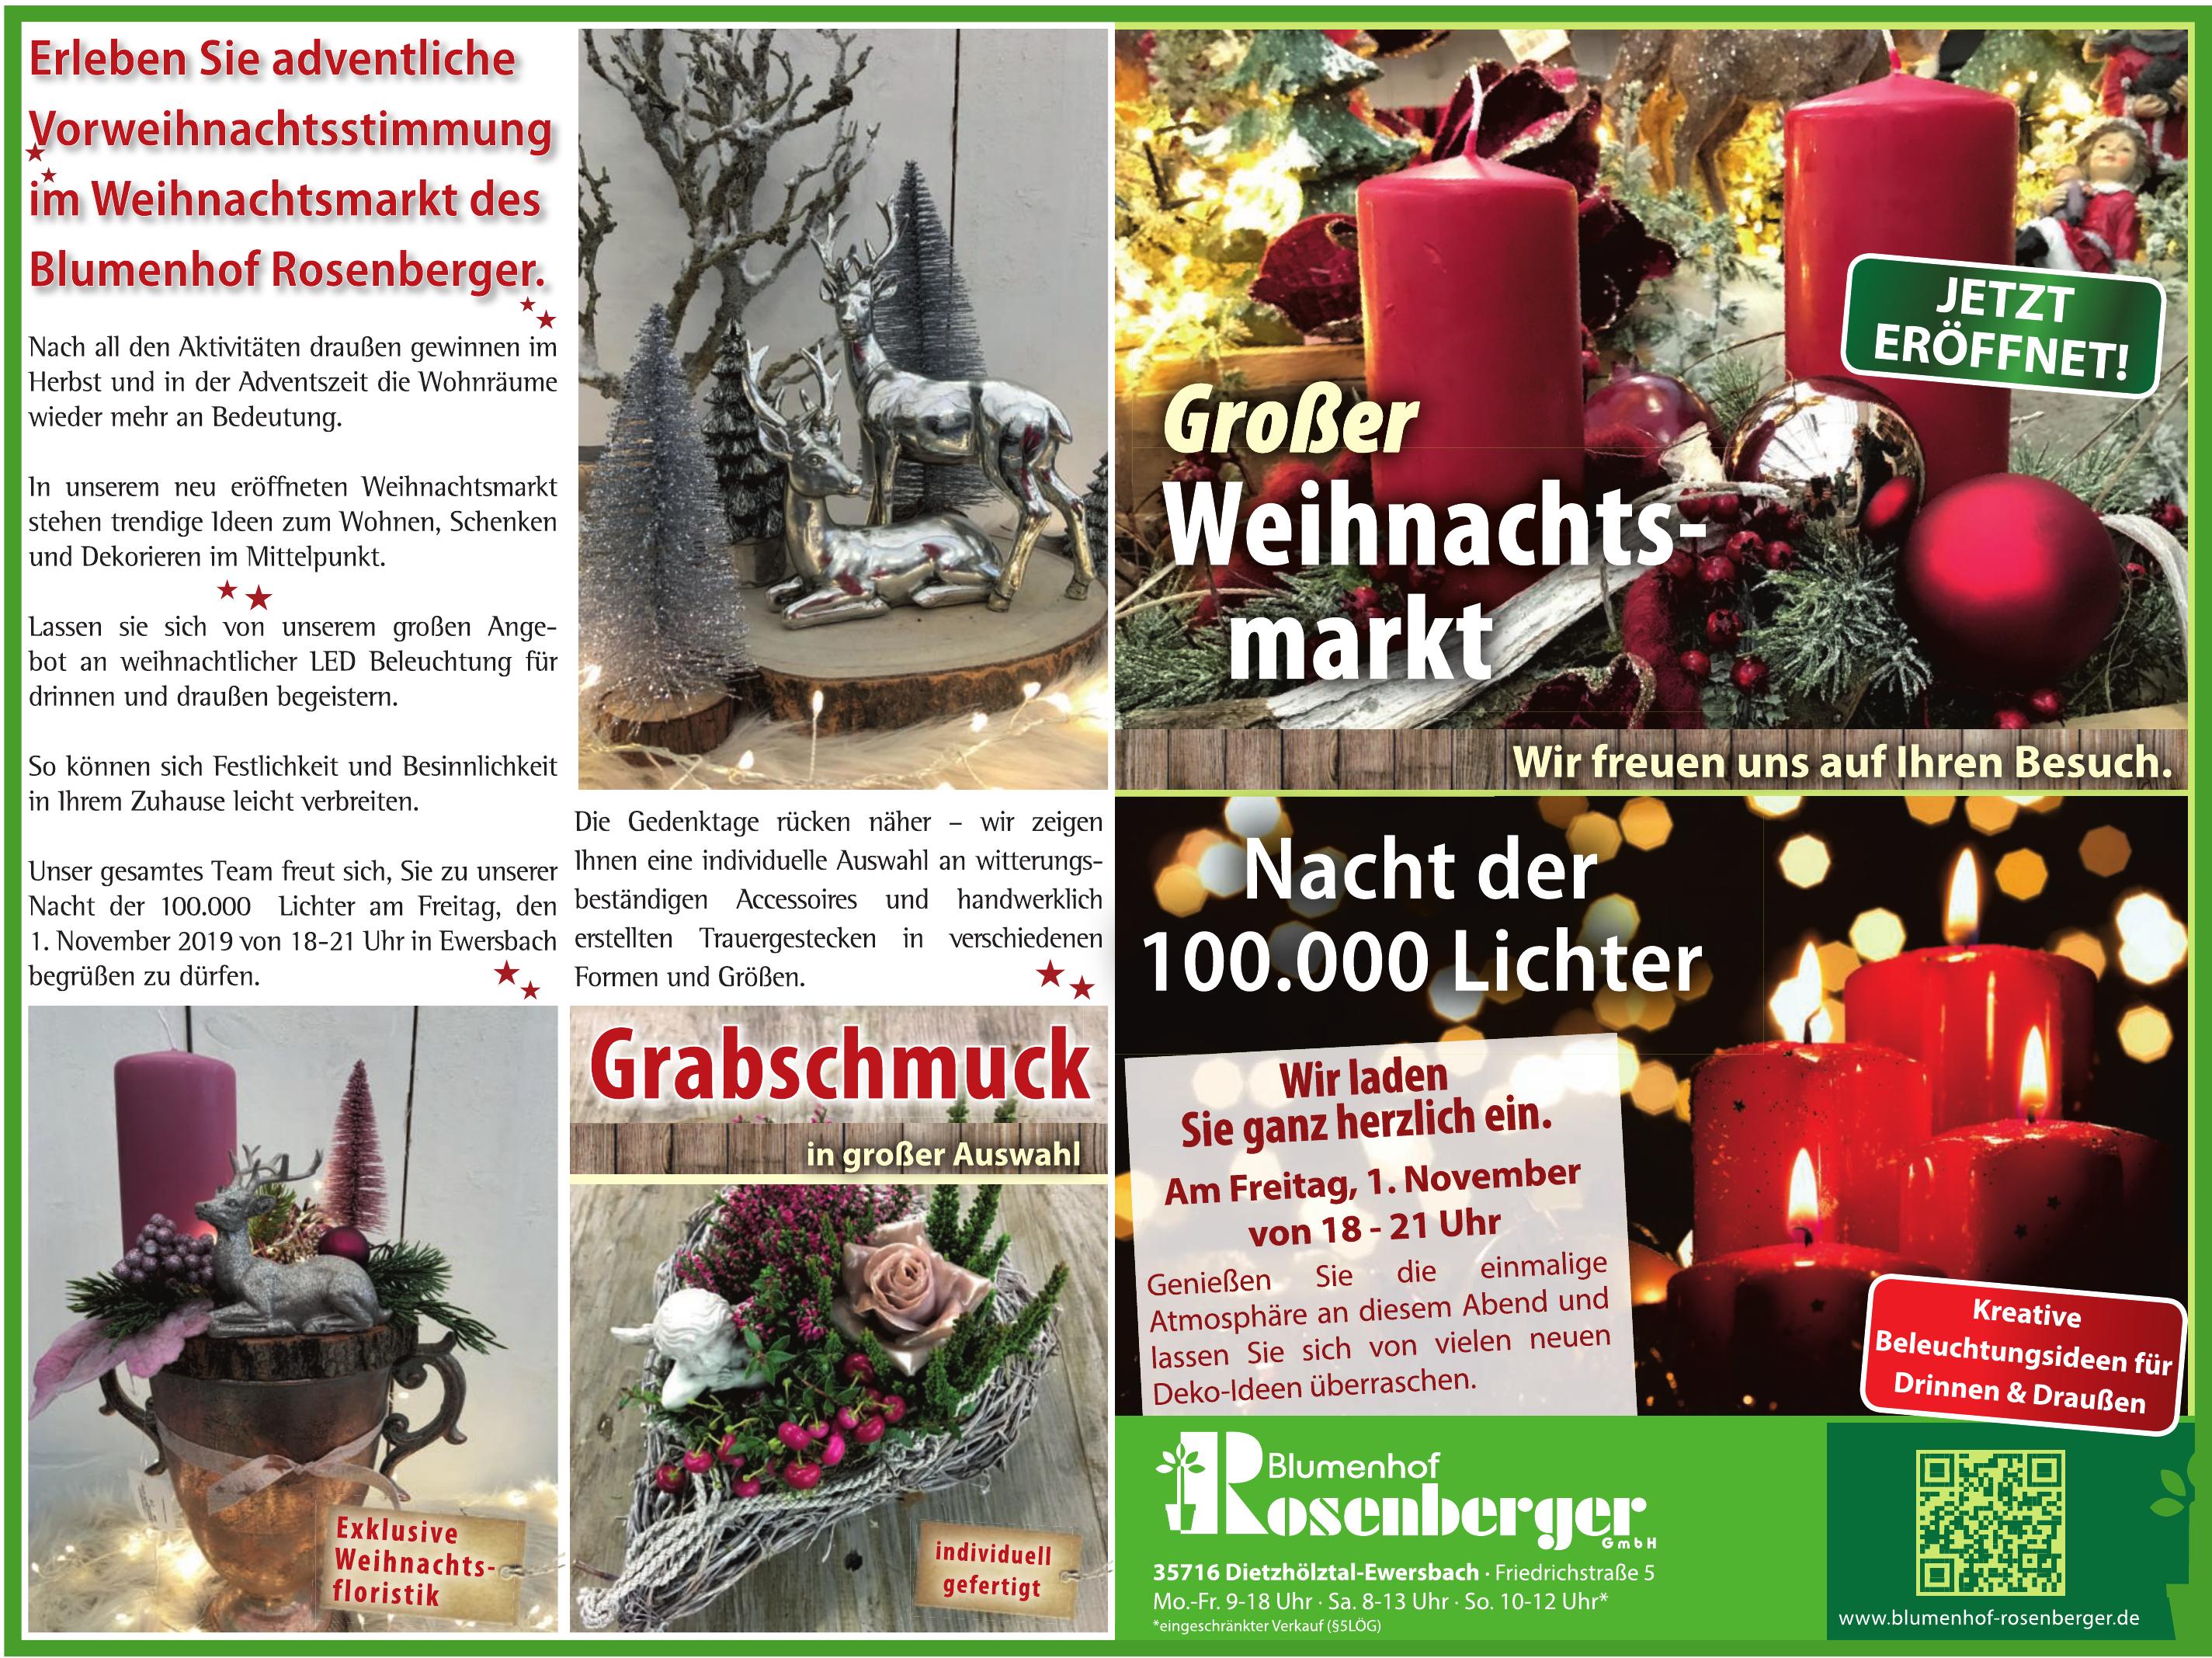 Blumenhof Rosenberger GmbH